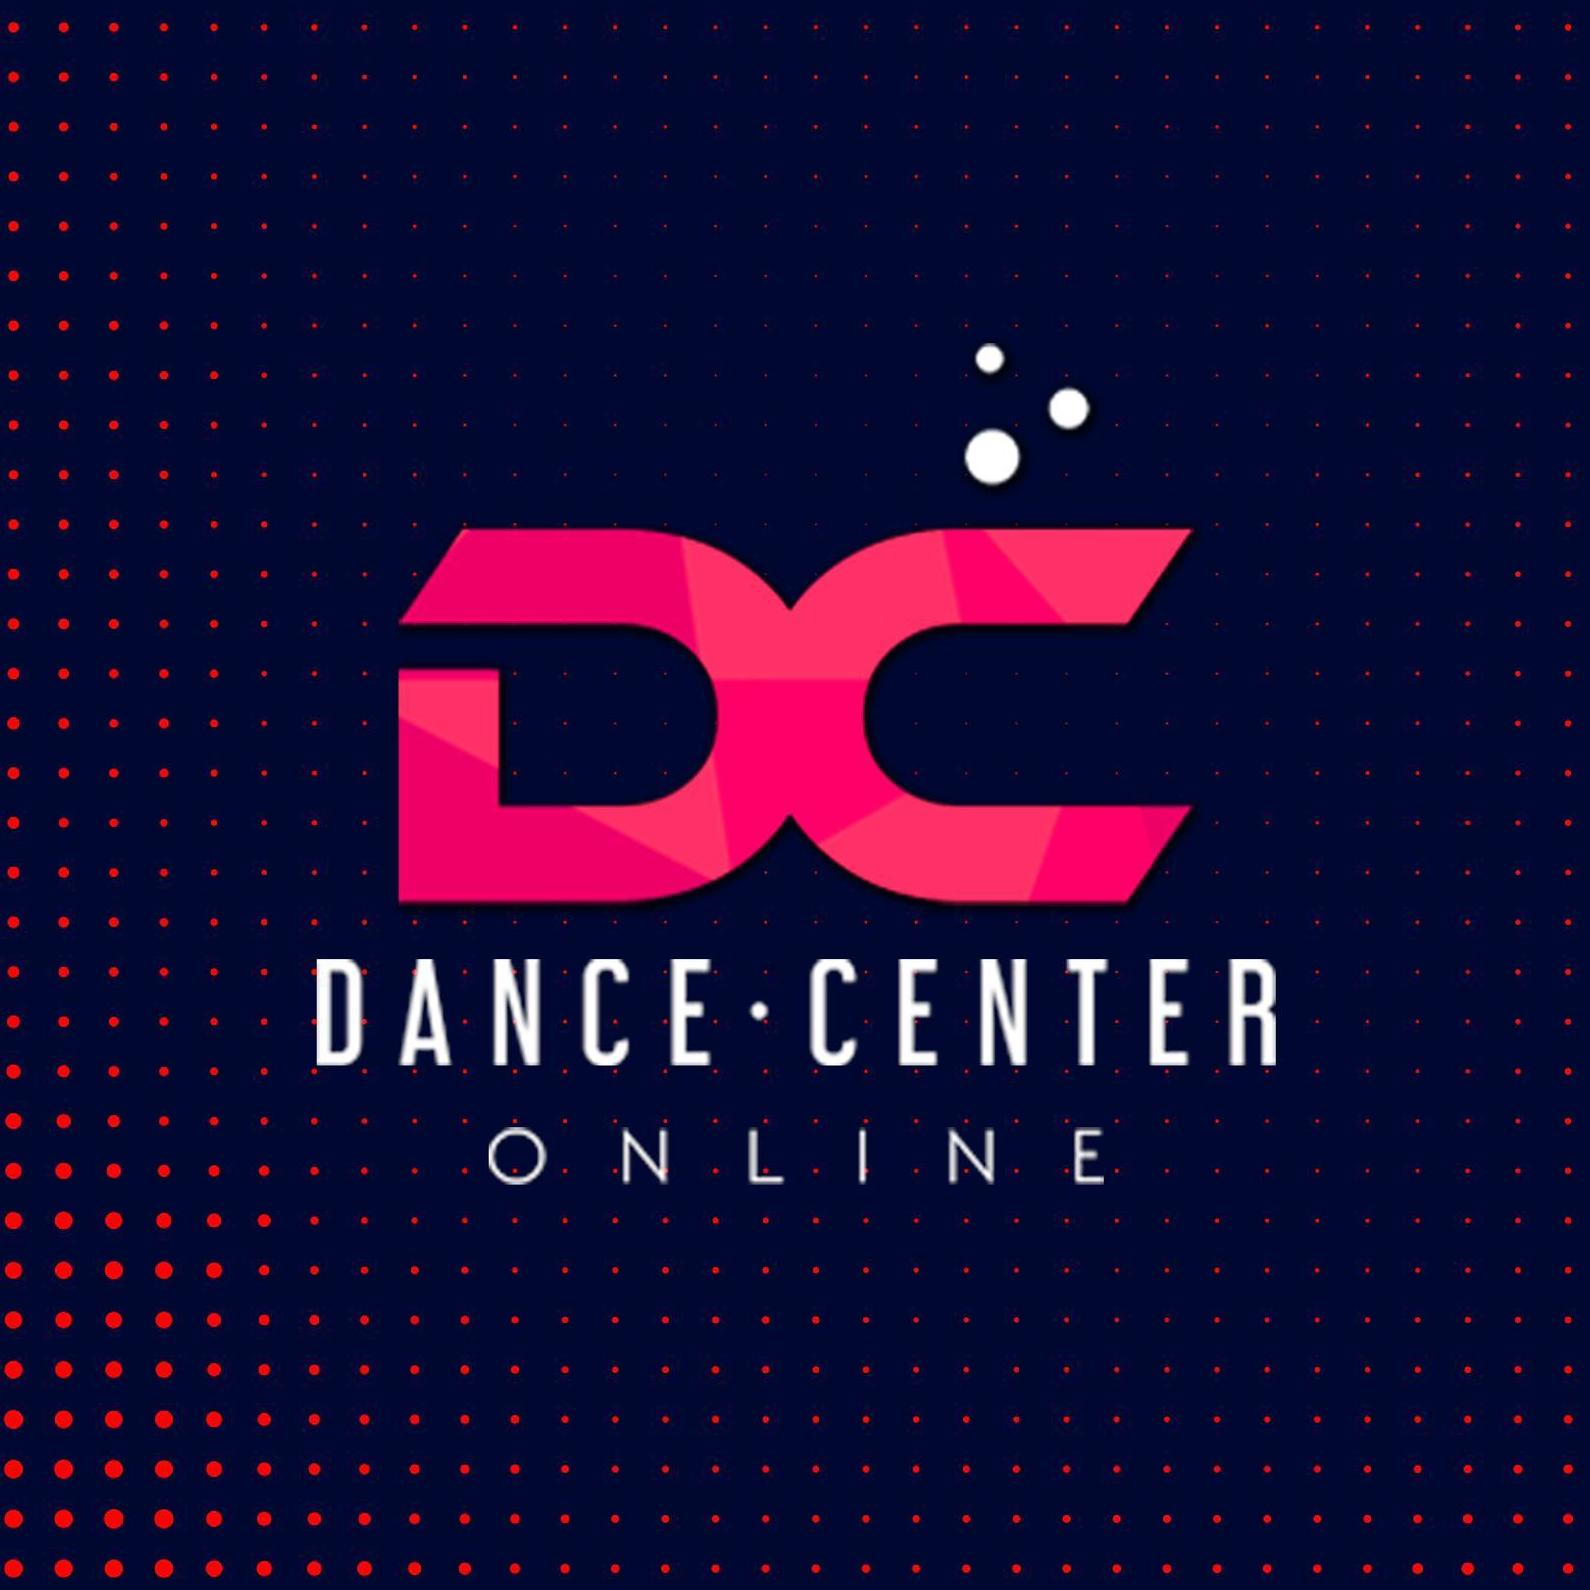 Dance Center On Line: Clases y Campamentos de Dance Center Valencia